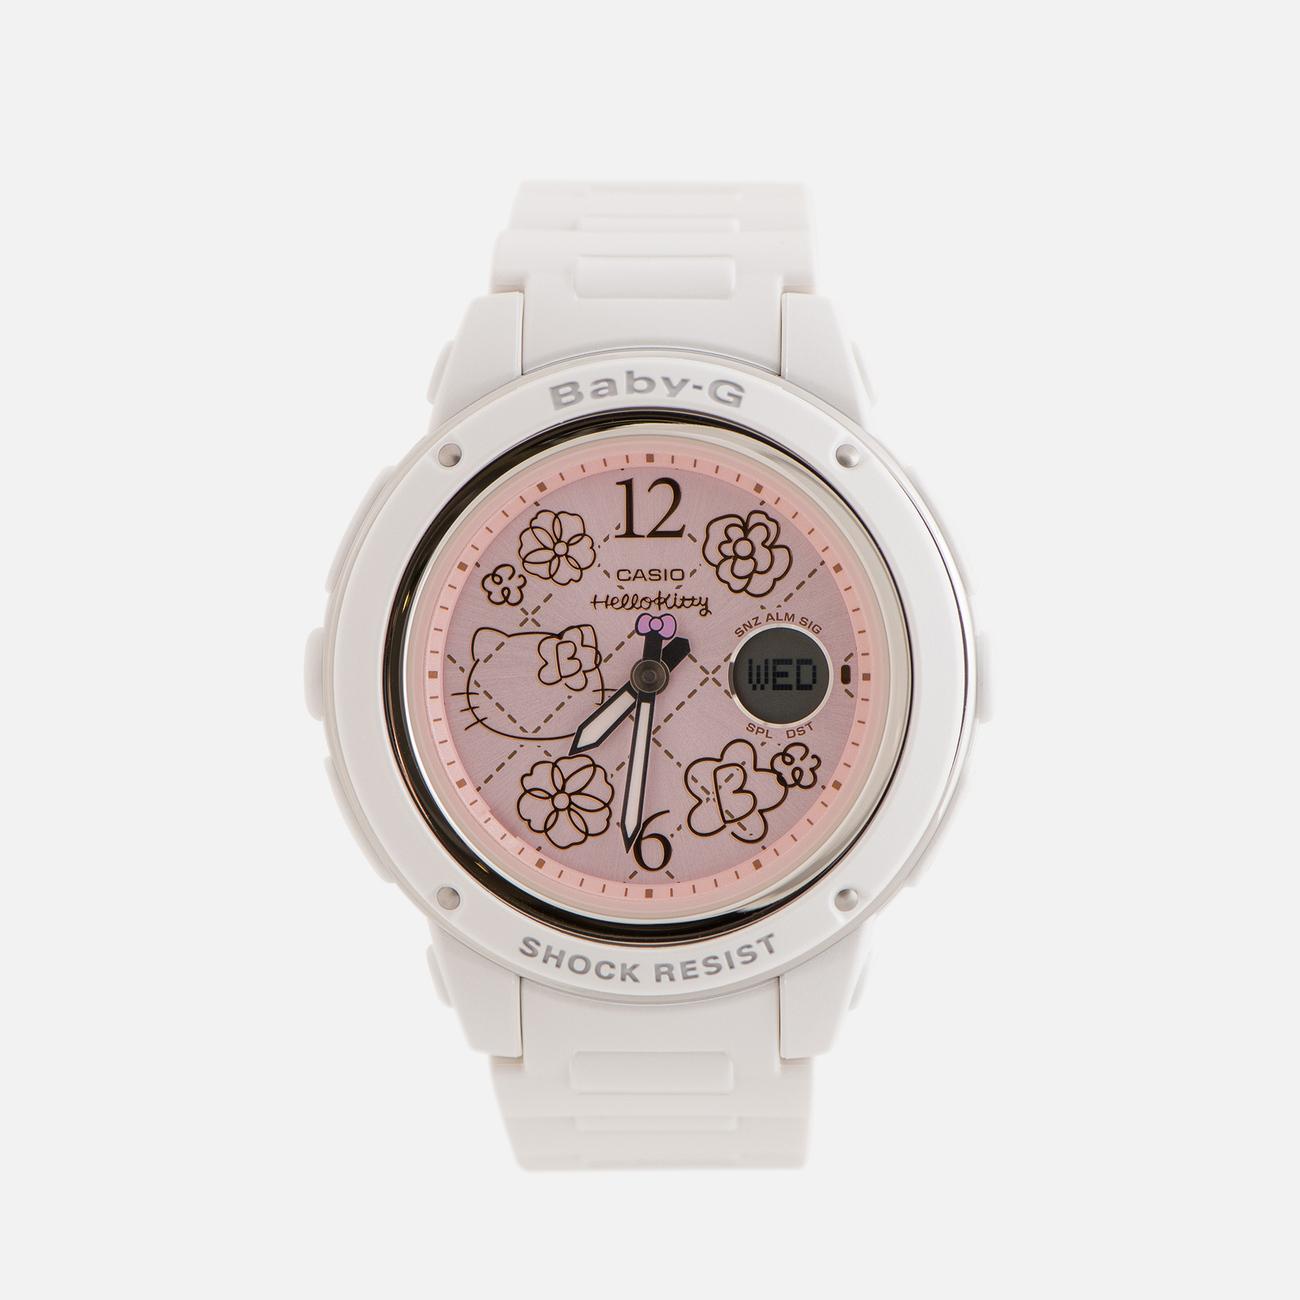 Женские наручные часы CASIO x Hello Kitty Baby-G BGA-150KT-7BER White